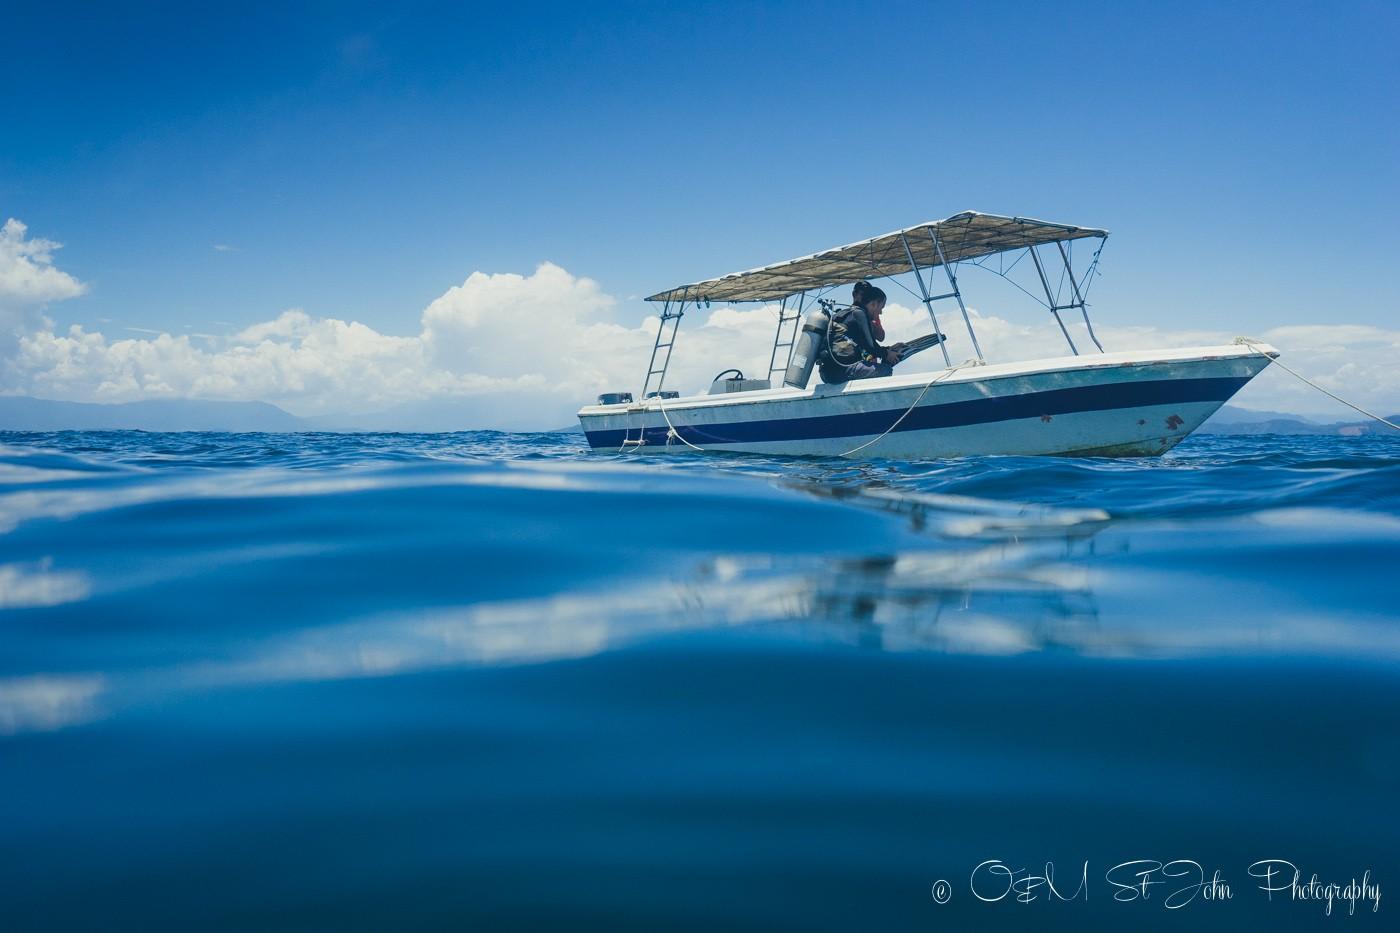 Bigfin Divers on the boat off the coast of Mañana Borneo Resort. Sabah. Malaysia